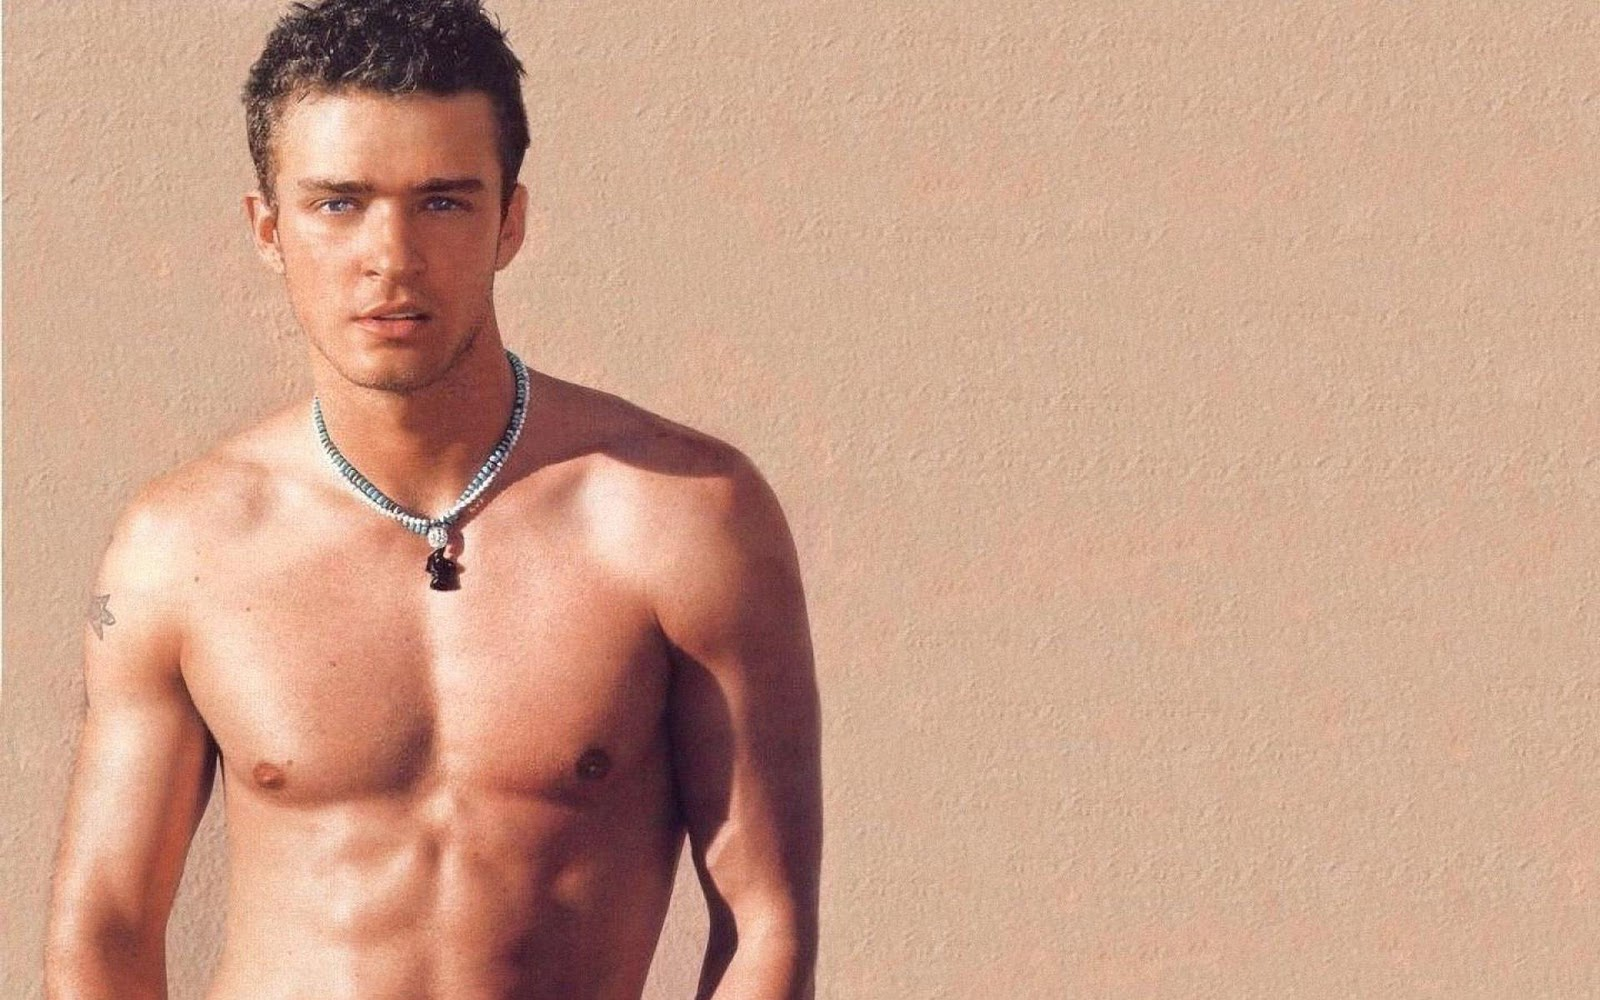 Alessandra Ambrosio Hd Wallpaper Justin Timberlake Photo Wallpapers Best Hd Desktop Wallpaper